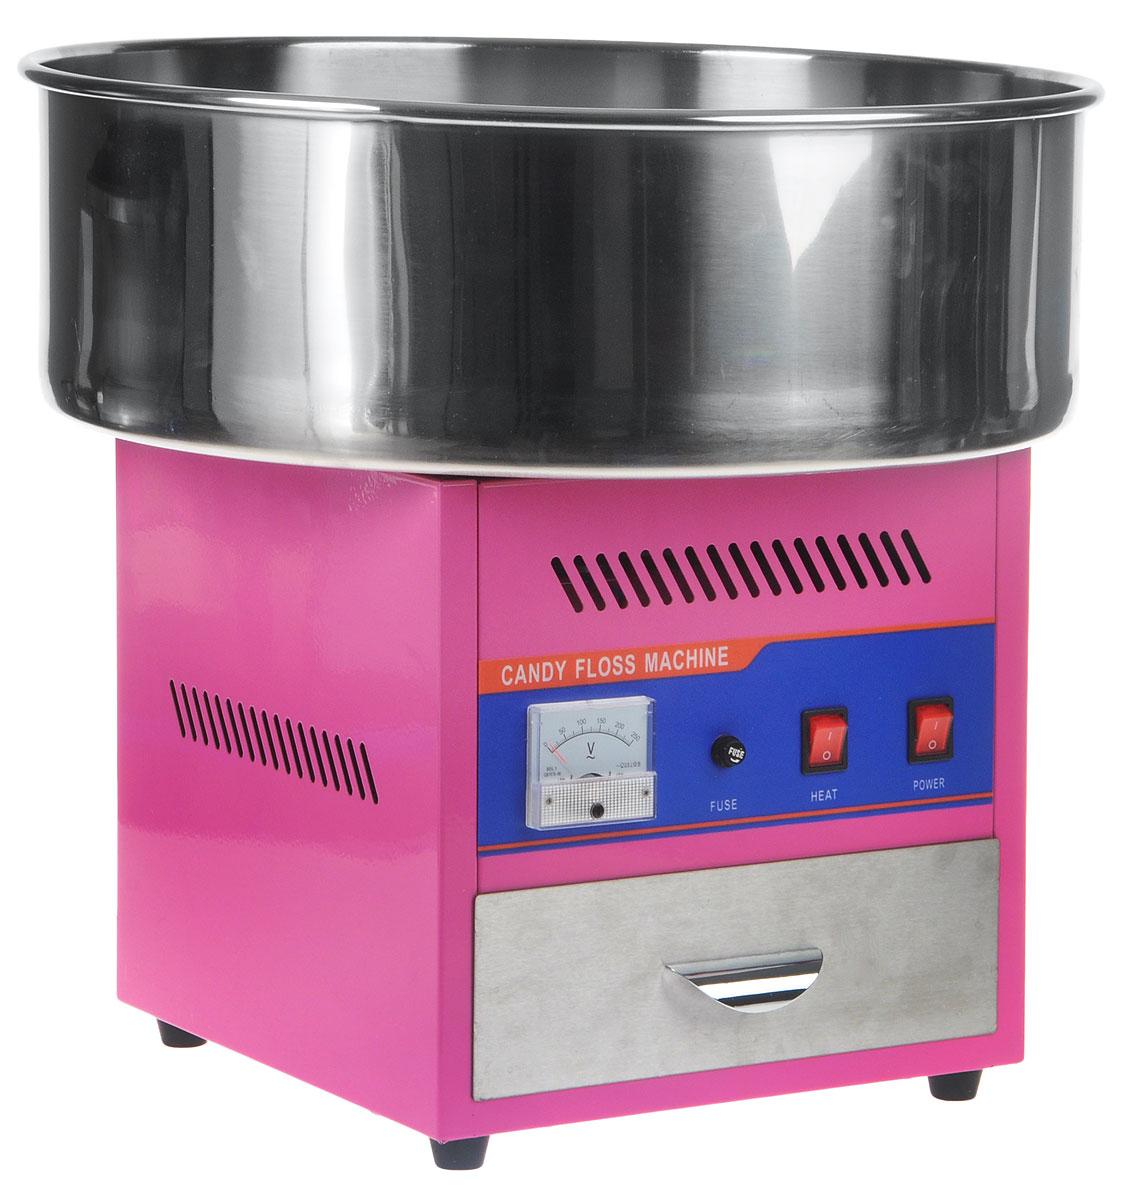 GASTRORAG HEC-01 аппарат для сахарной ваты аппарат для сахарной ваты bradex аппарат для сахарной ваты